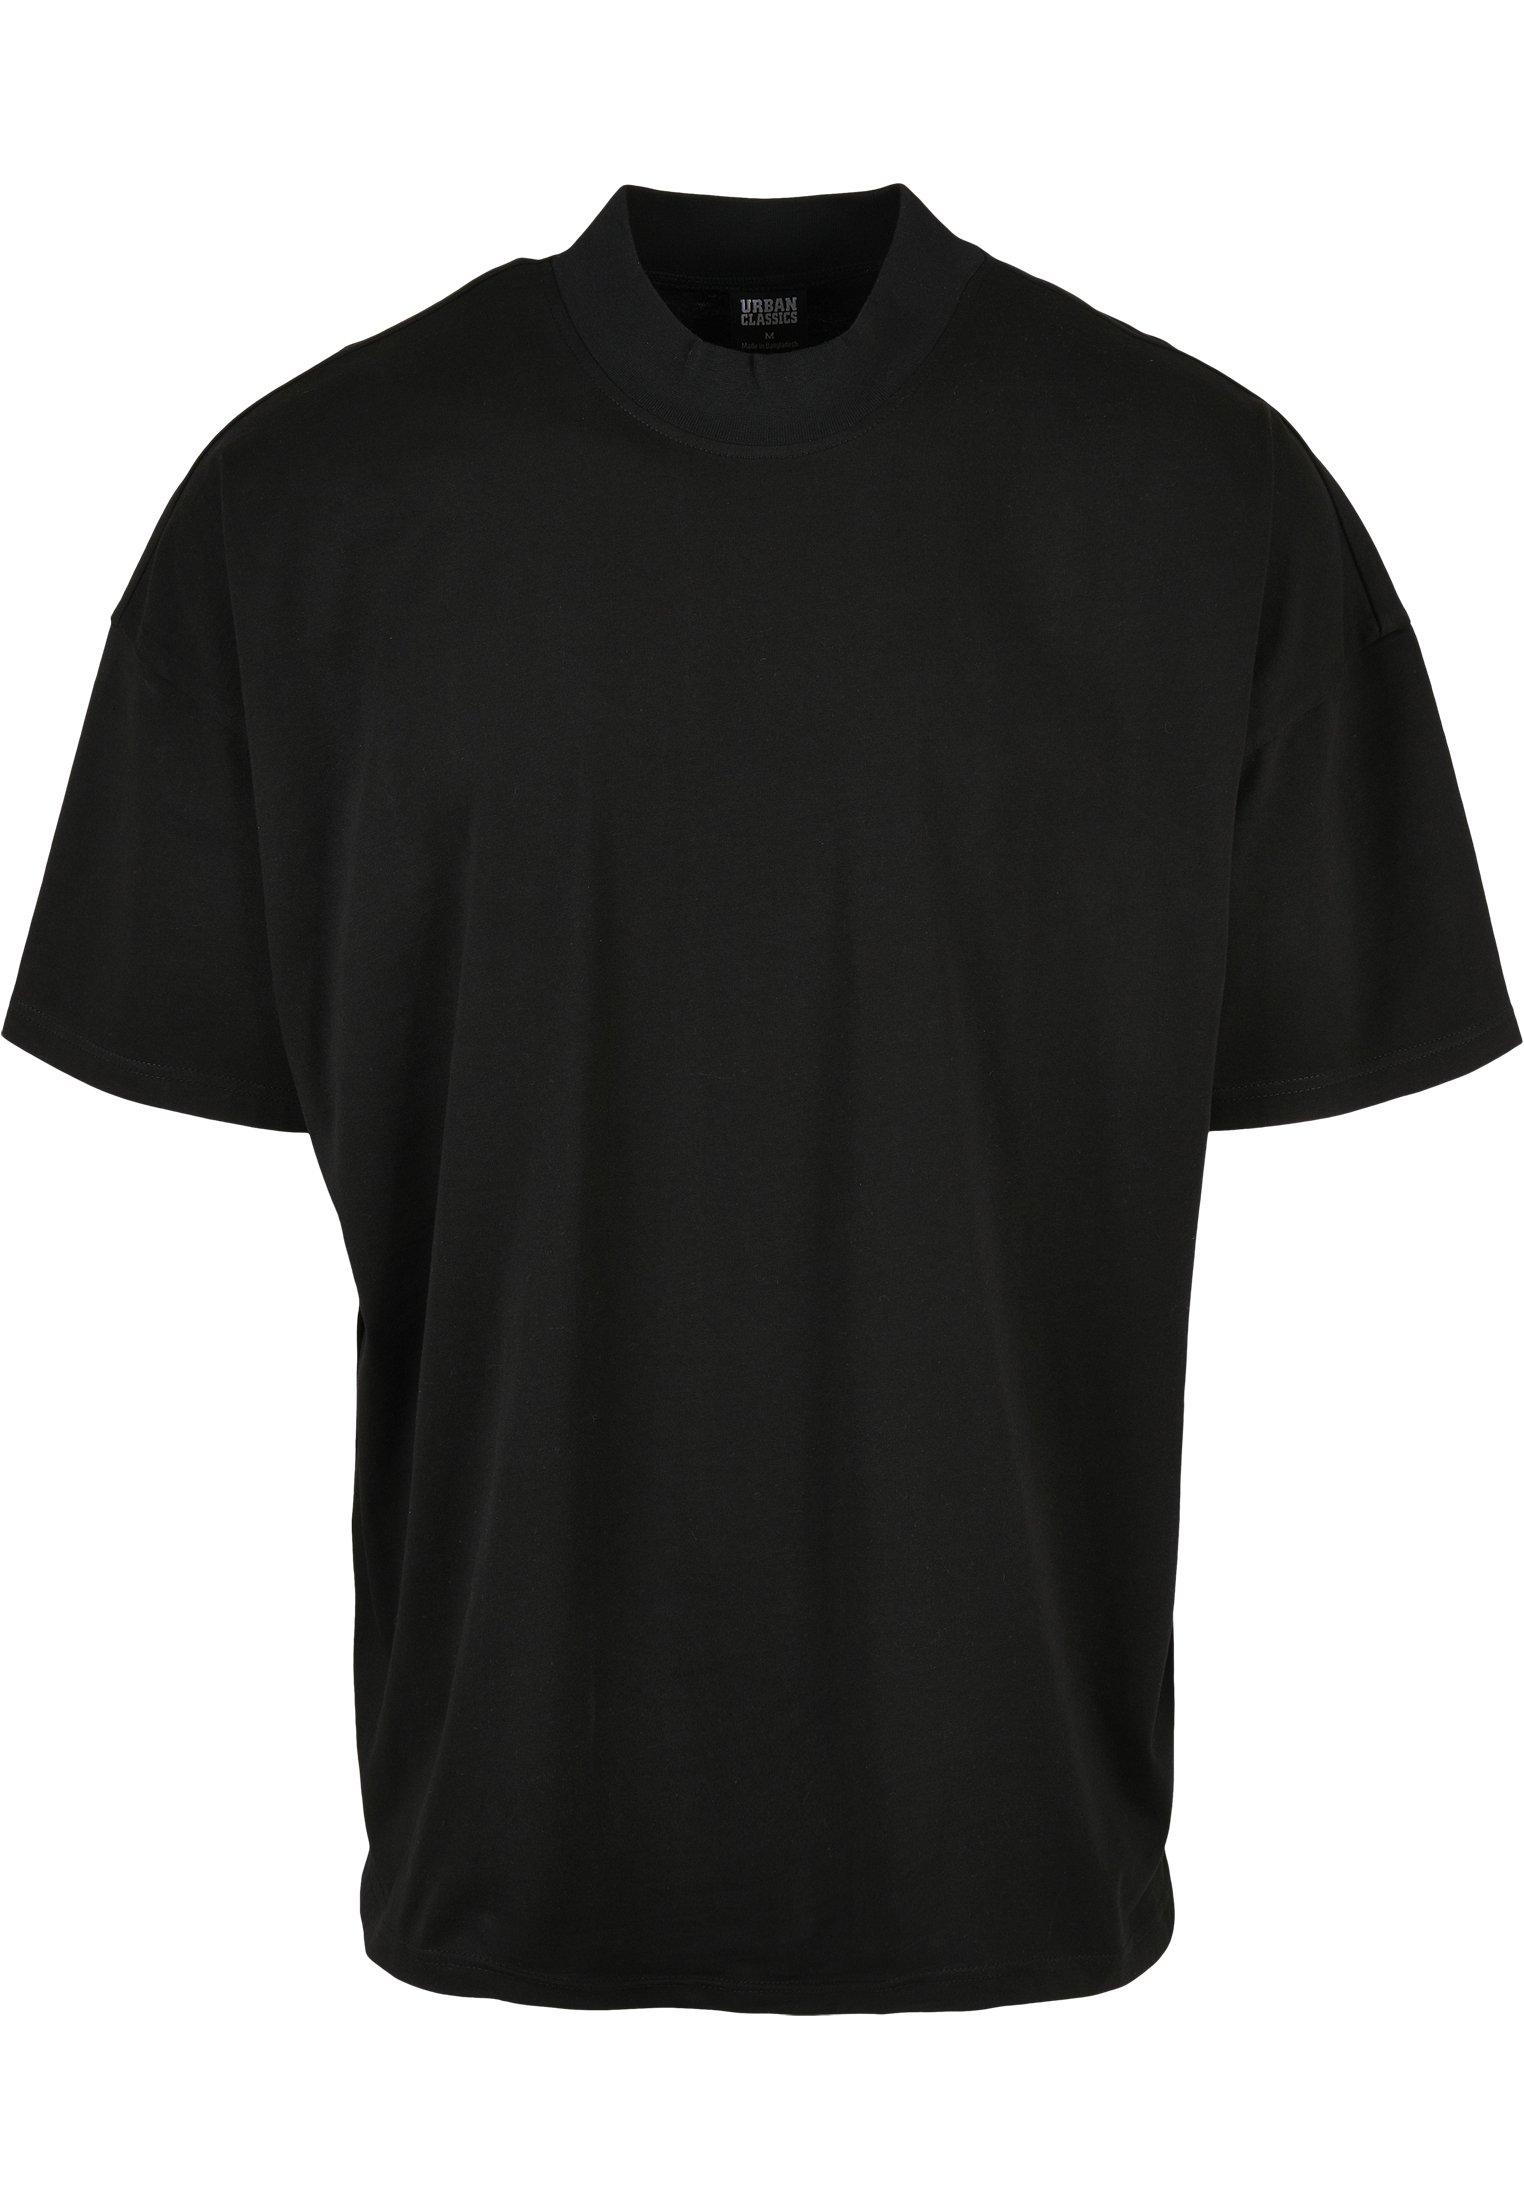 Homme OVERSIZED MOCK NECK - T-shirt basique